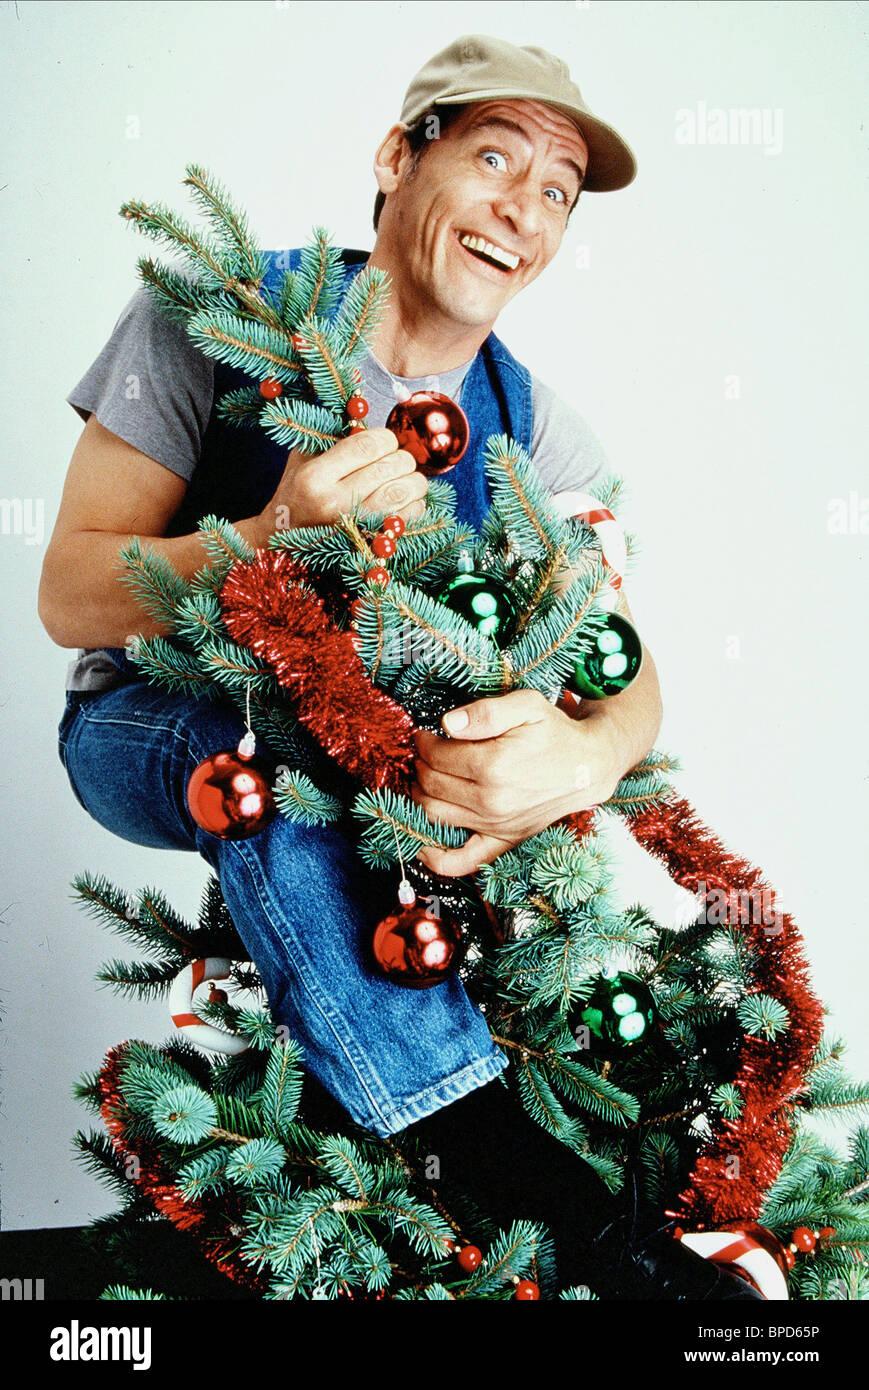 Ernest Saves Christmas Stock Photos & Ernest Saves Christmas Stock ...